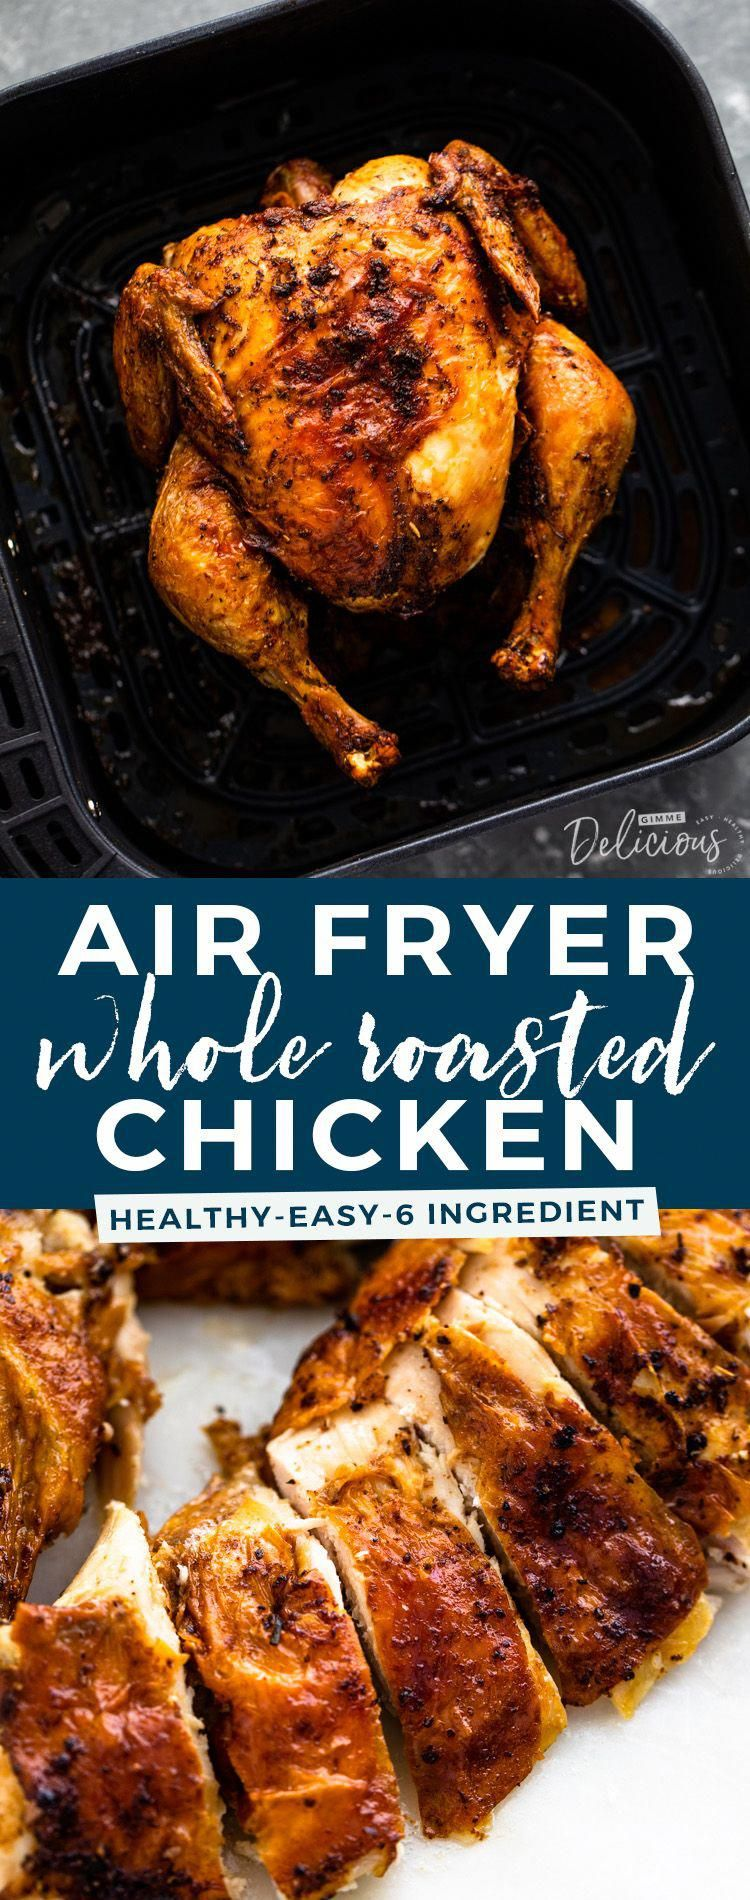 air fryer recipes vegetarian Recipes in 2020 Best